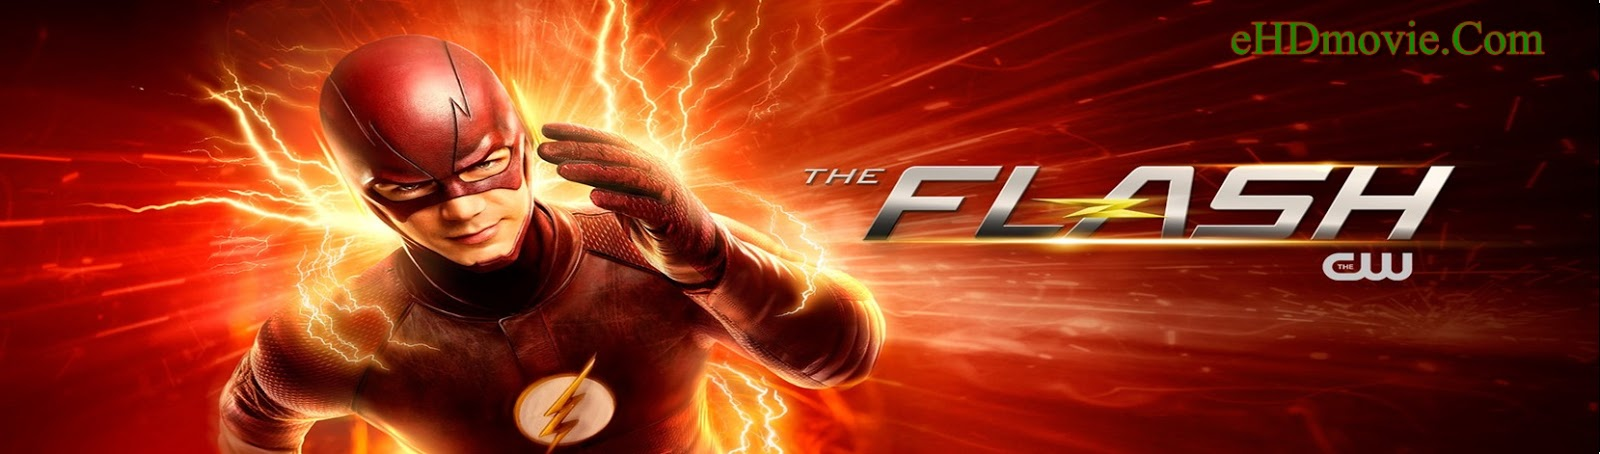 The Flash S01 Complete Dual Audio 720p BRRip [Hindi – English] ESubs